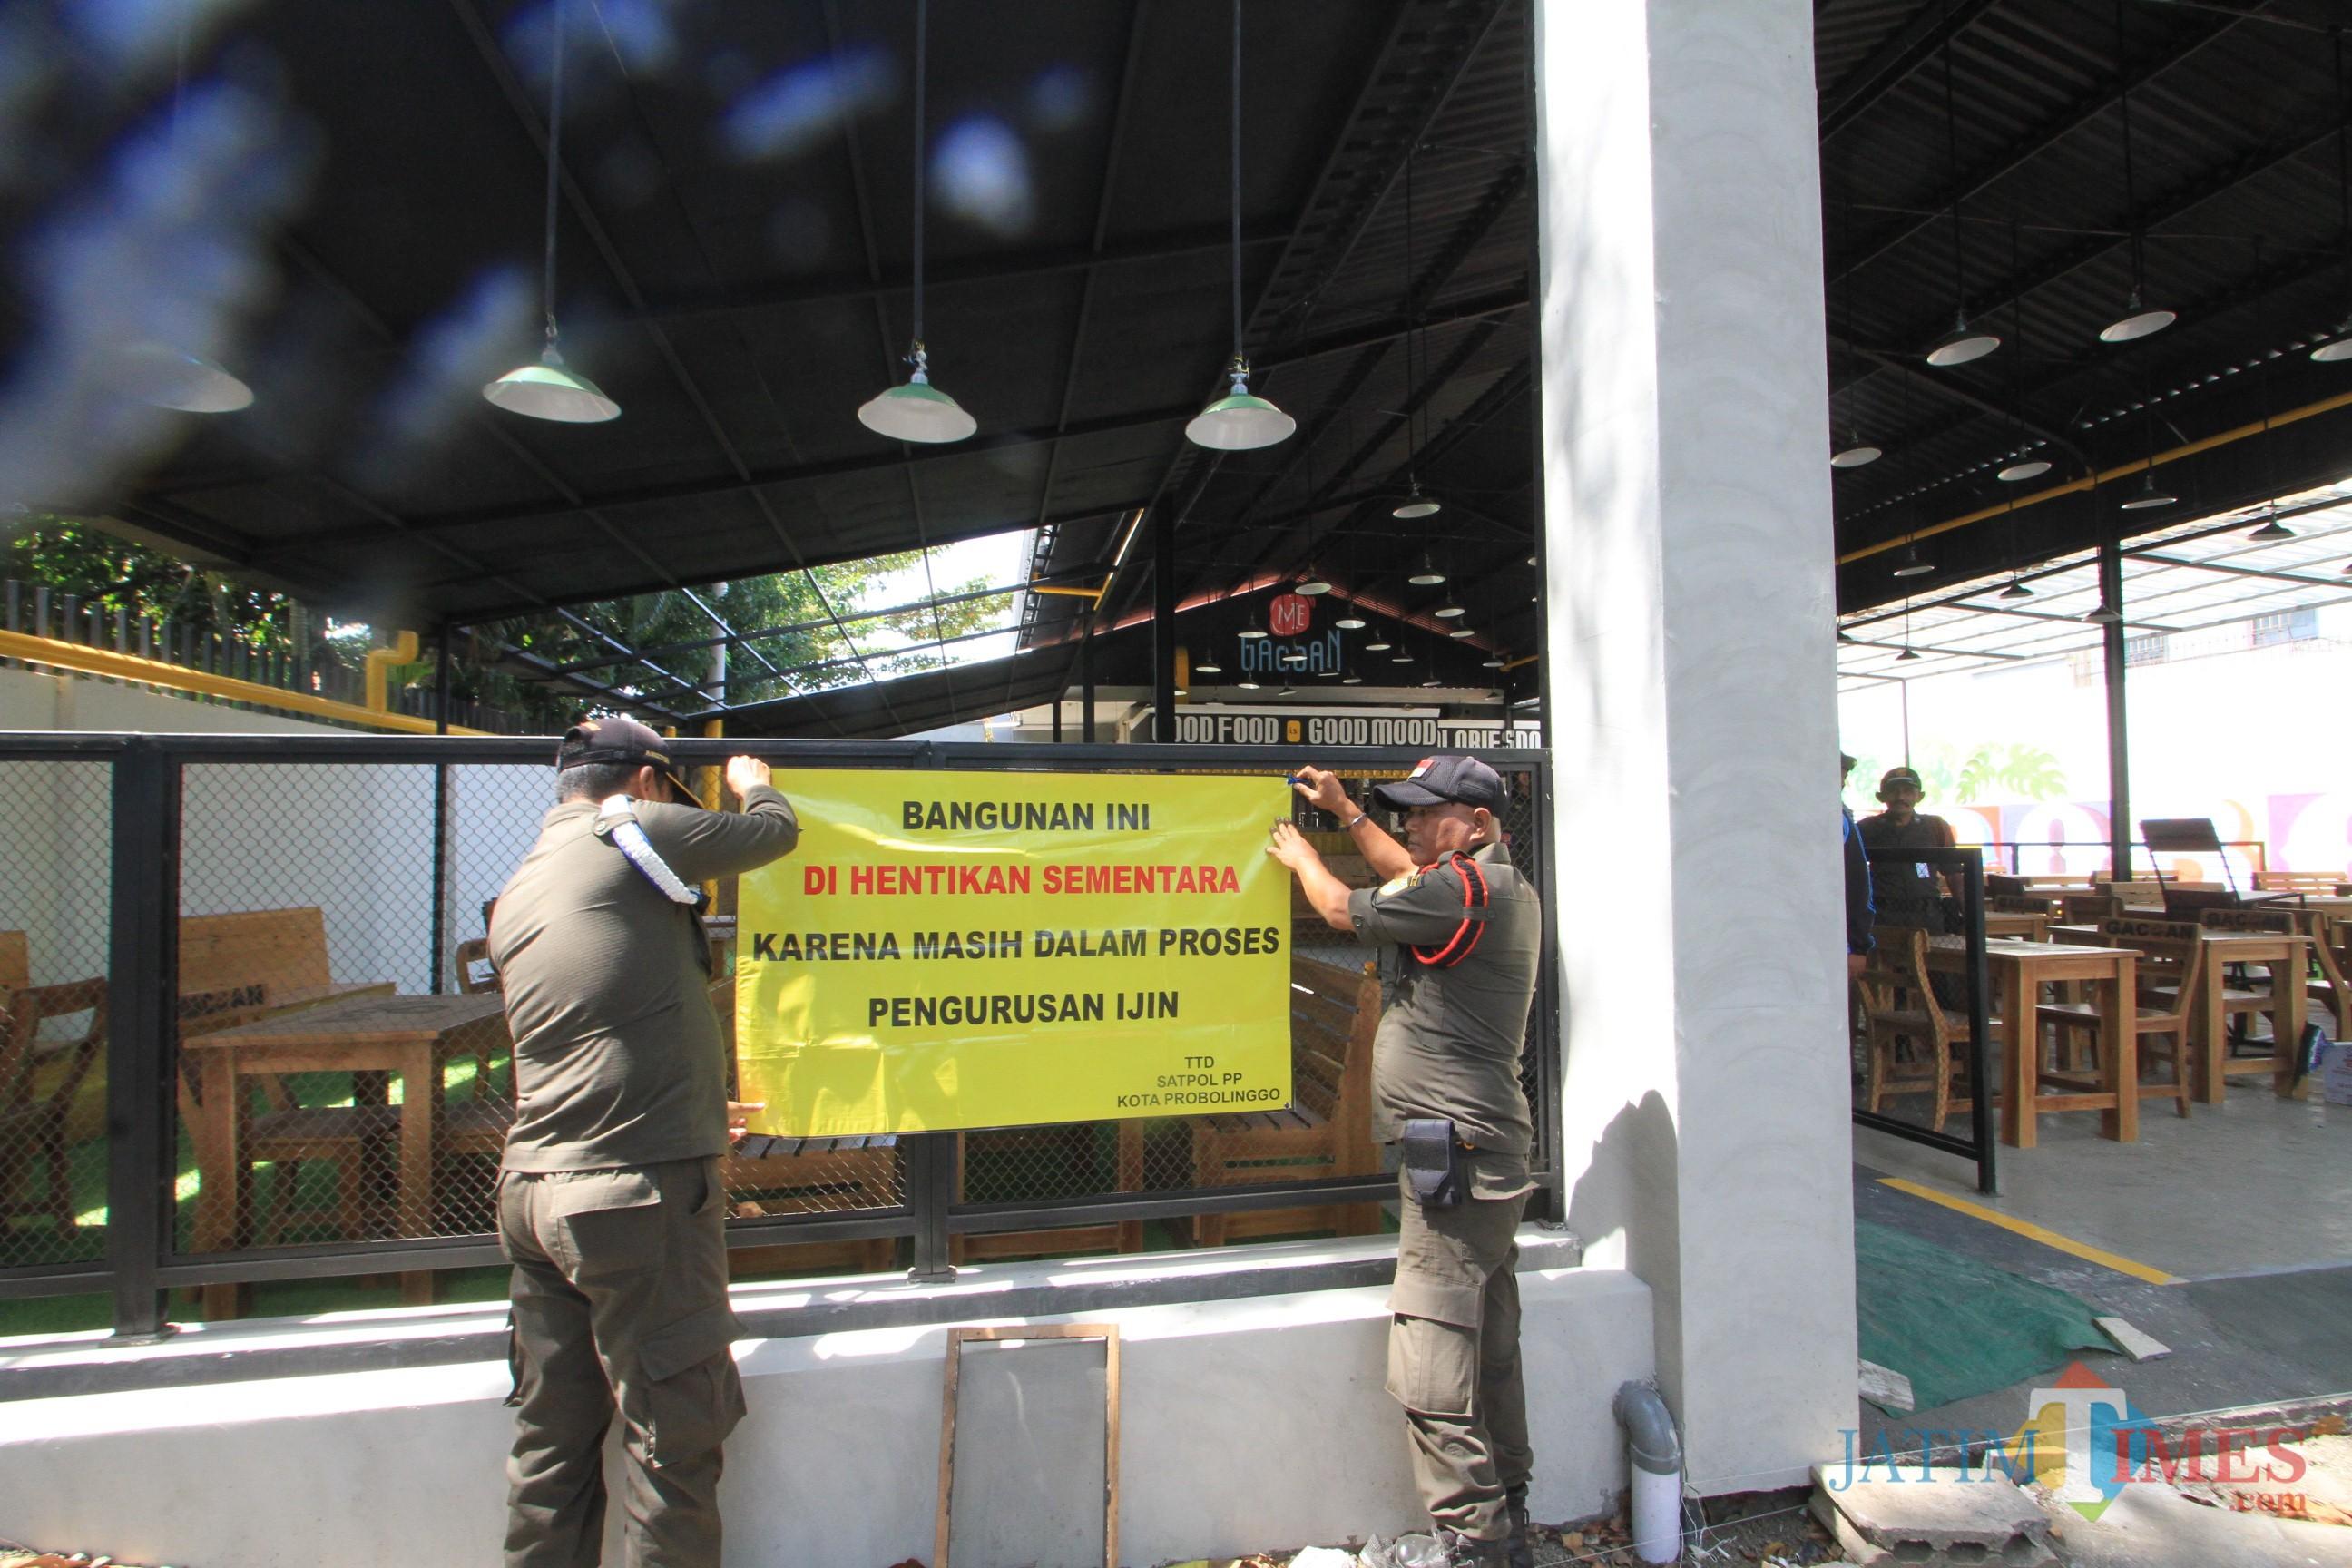 Petugas Satpol PP tengah memasang spandulkk penutupan warung mie di jalan Suroyo, Kota Probolinggo (Agus Salam/Jatim TIMES)